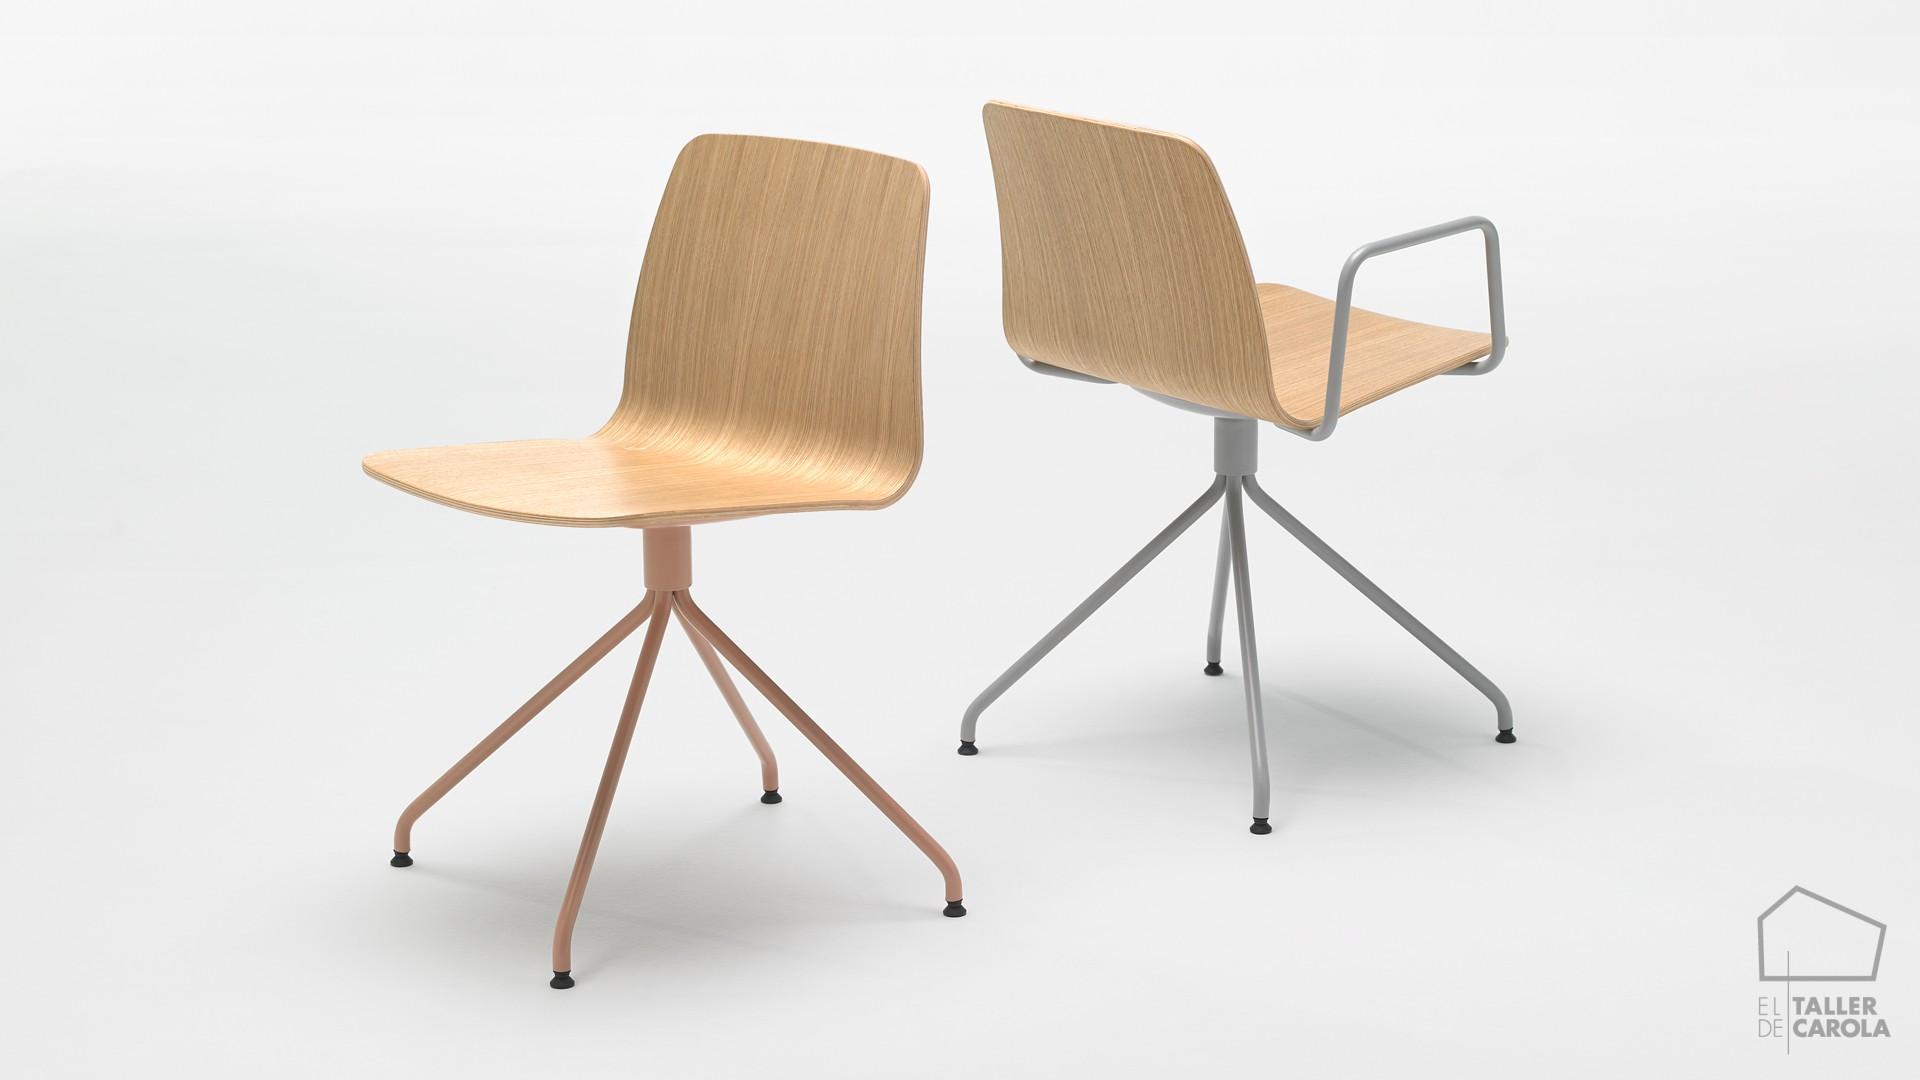 062var0450ng-sillas-madera-pata-metal-giratoria